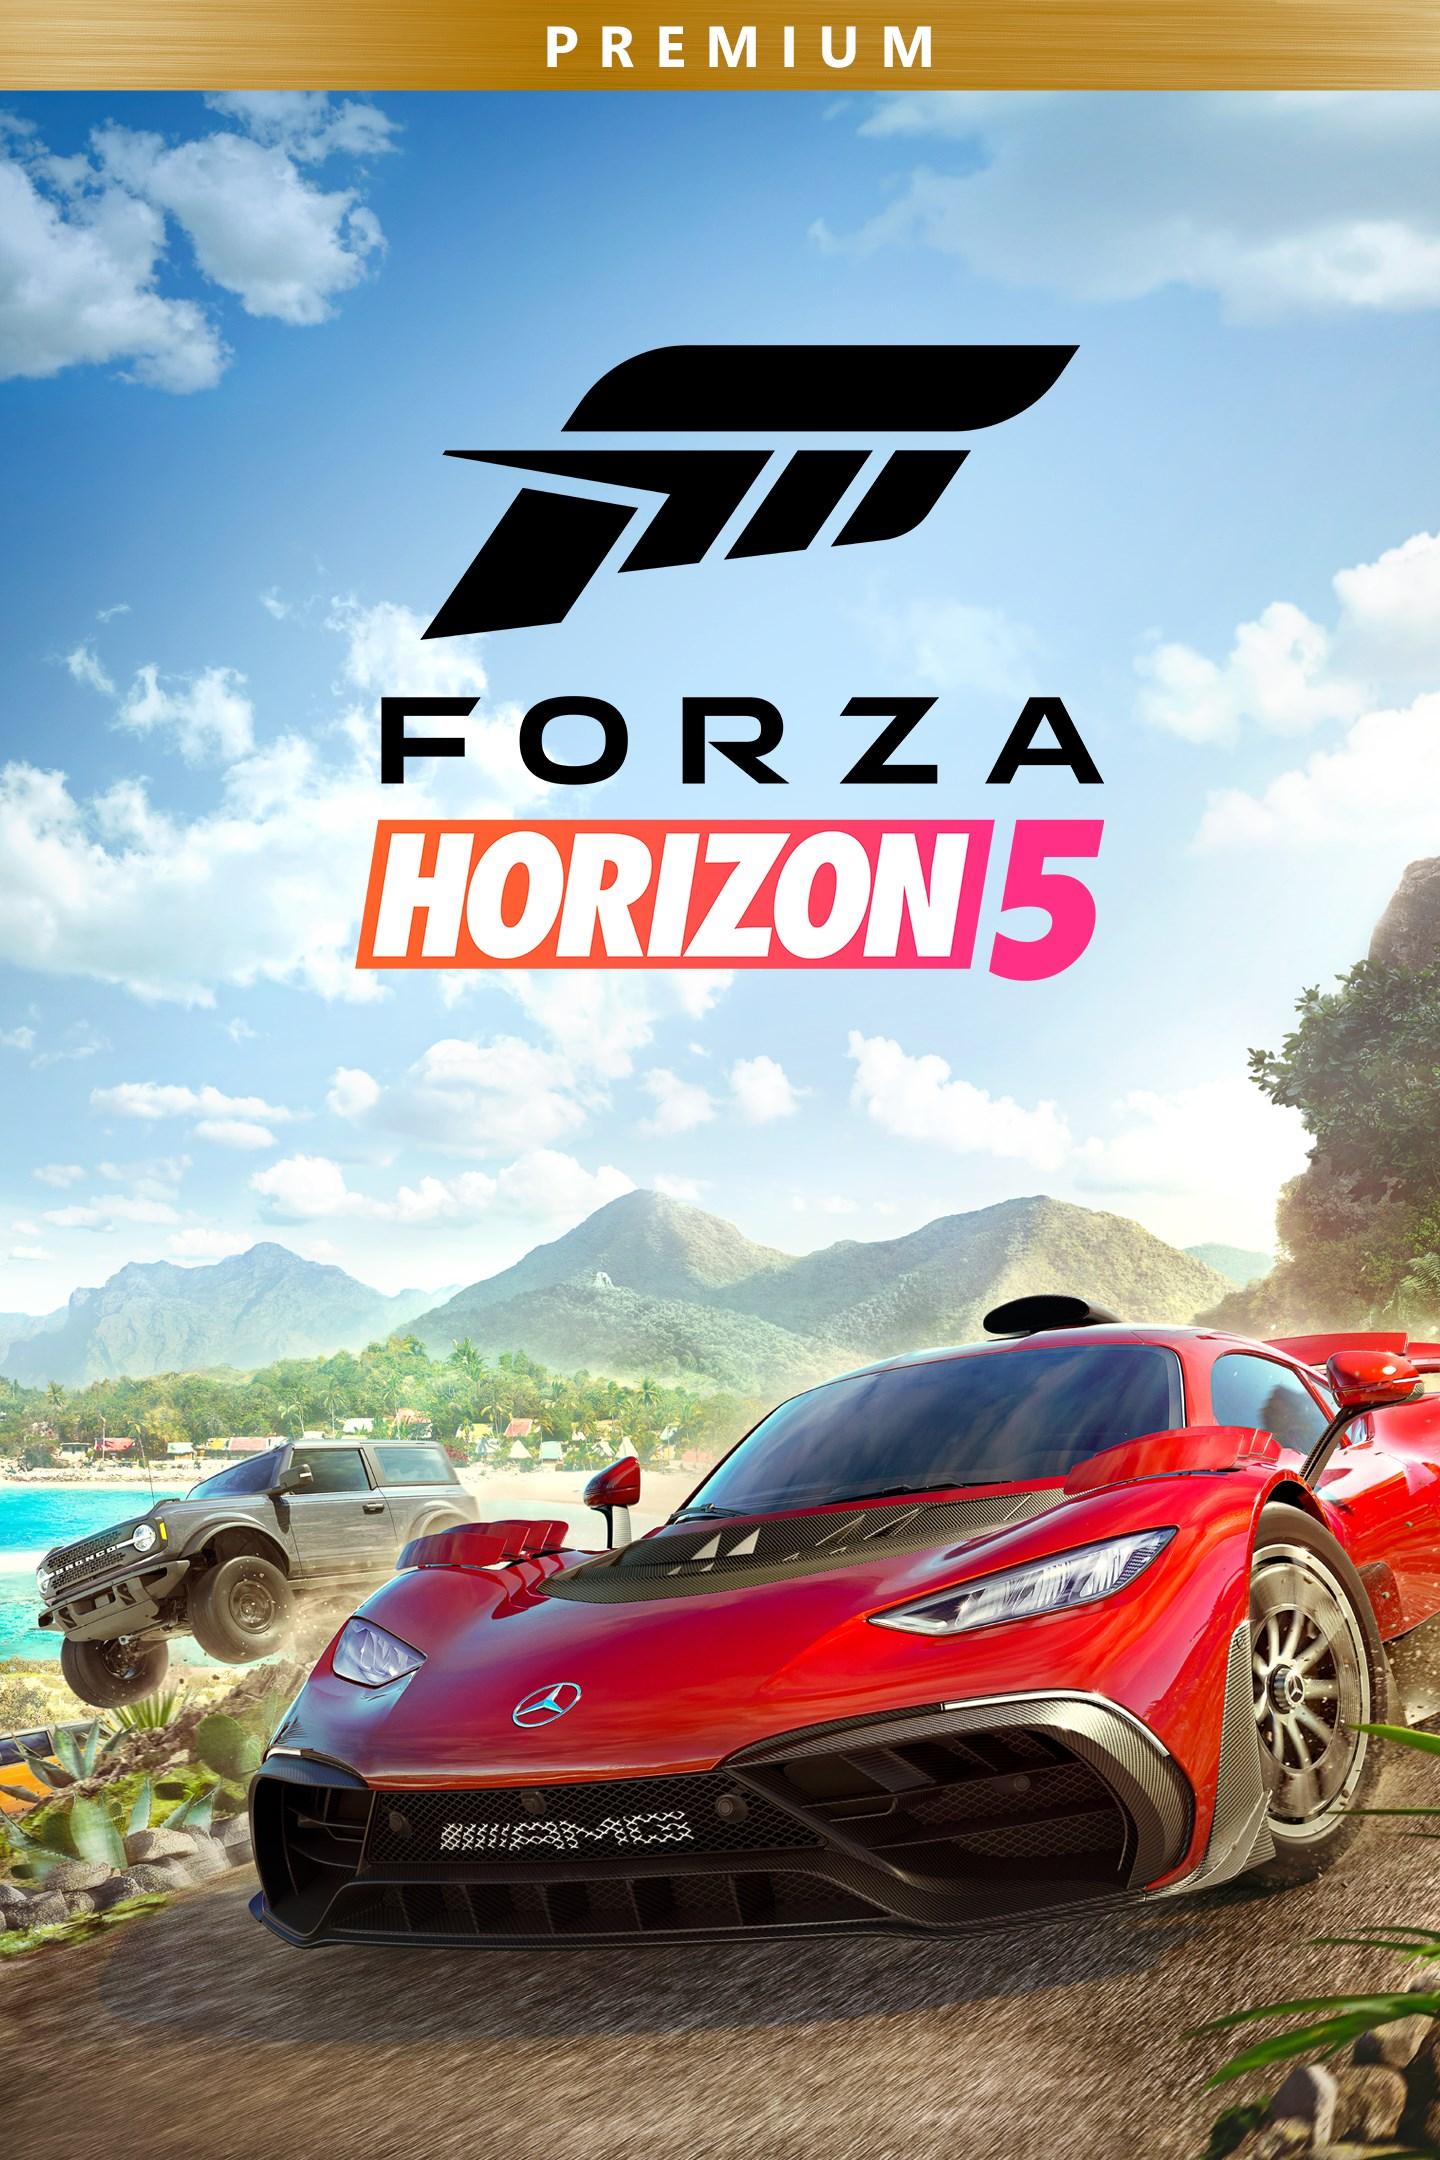 Best PCs for Forza Horizon 5